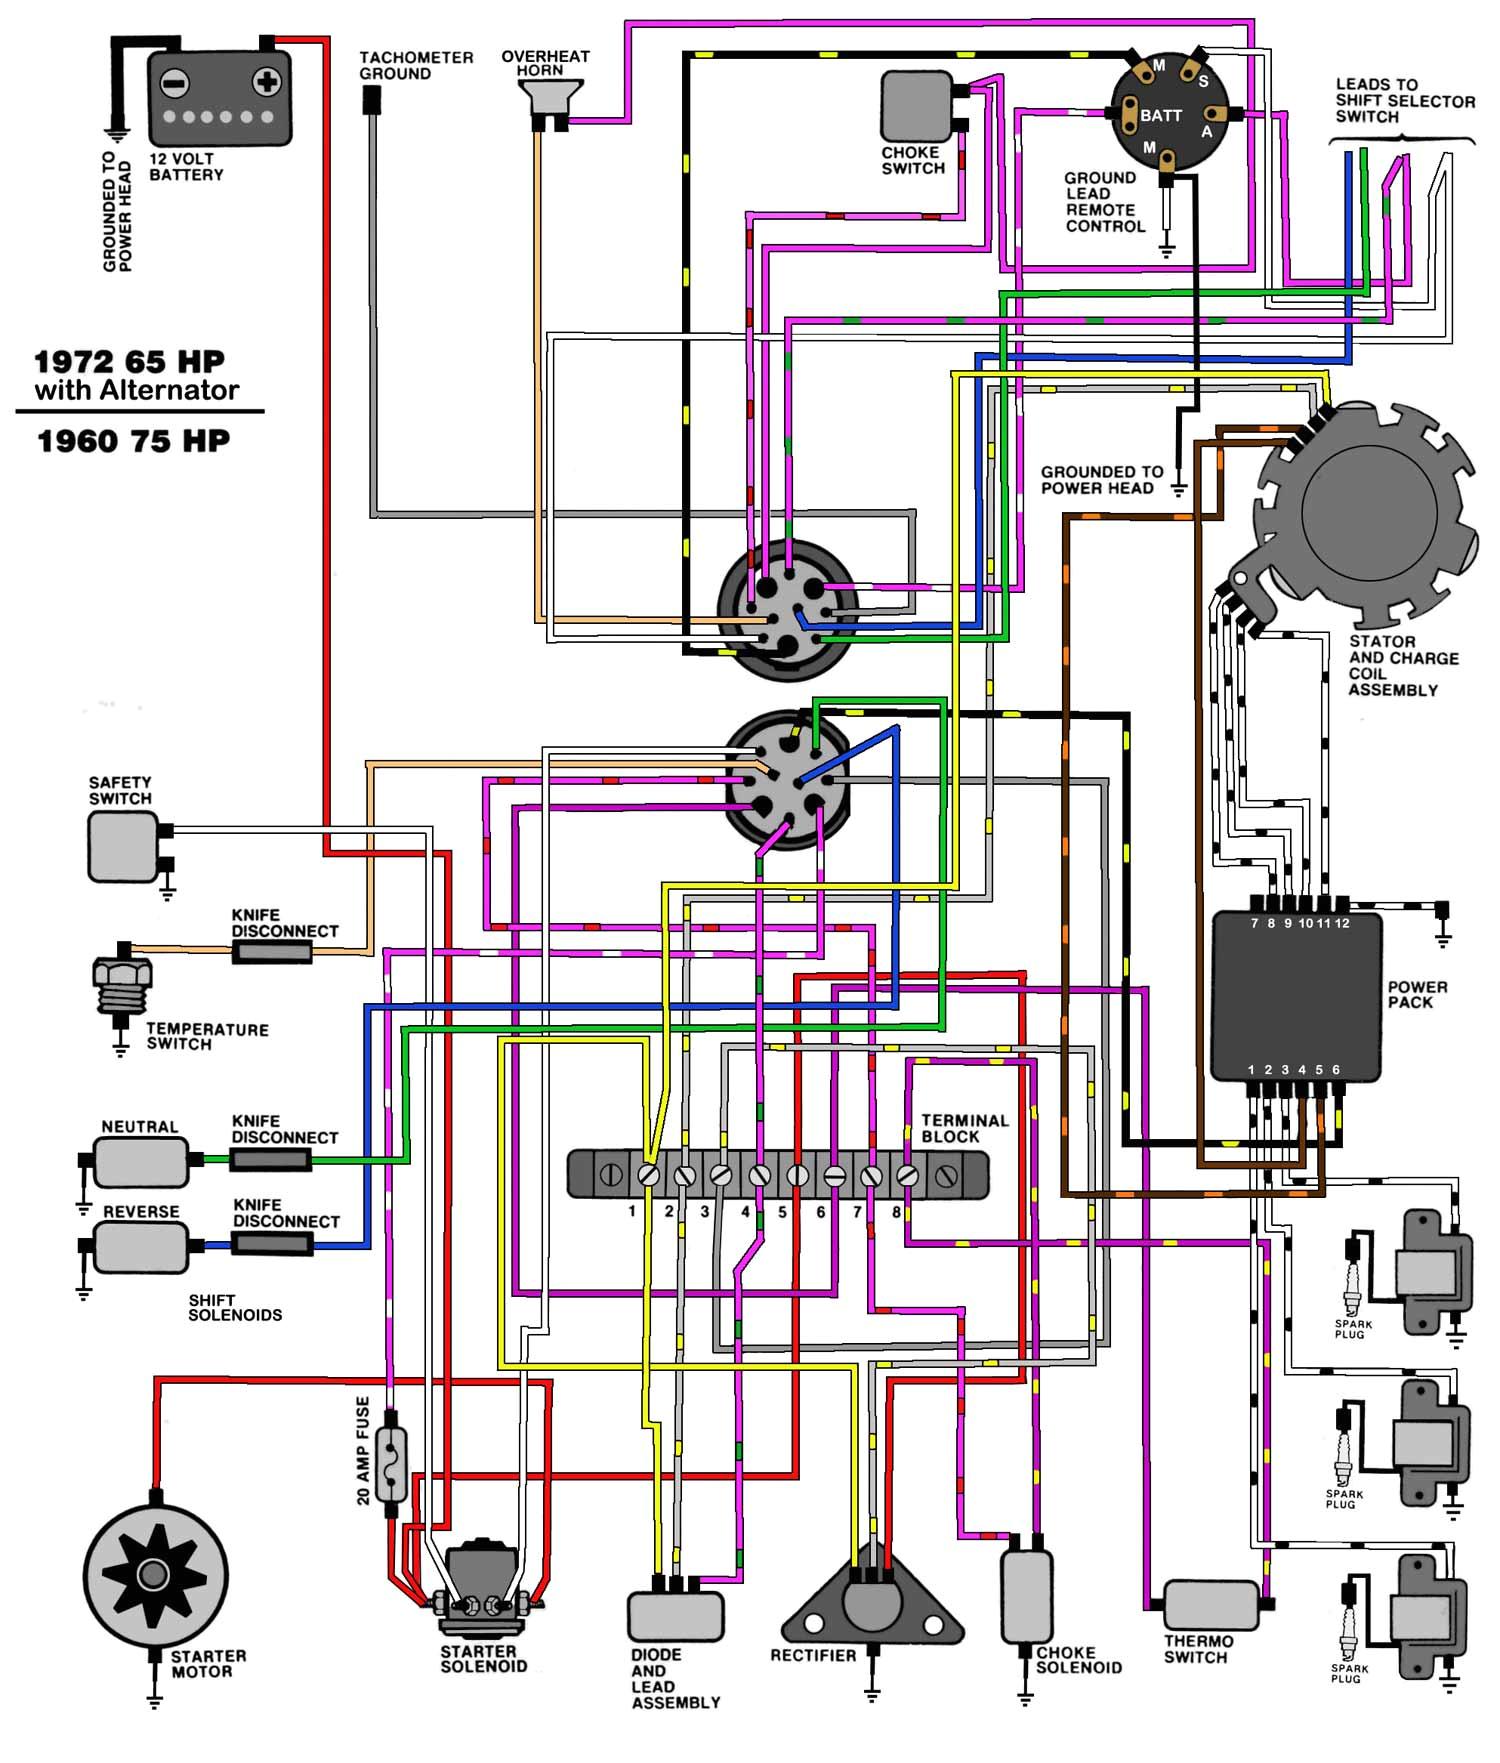 evinrude johnson outboard wiring diagrams mastertech marine omc control wiring diagrams omc control wiring diagrams